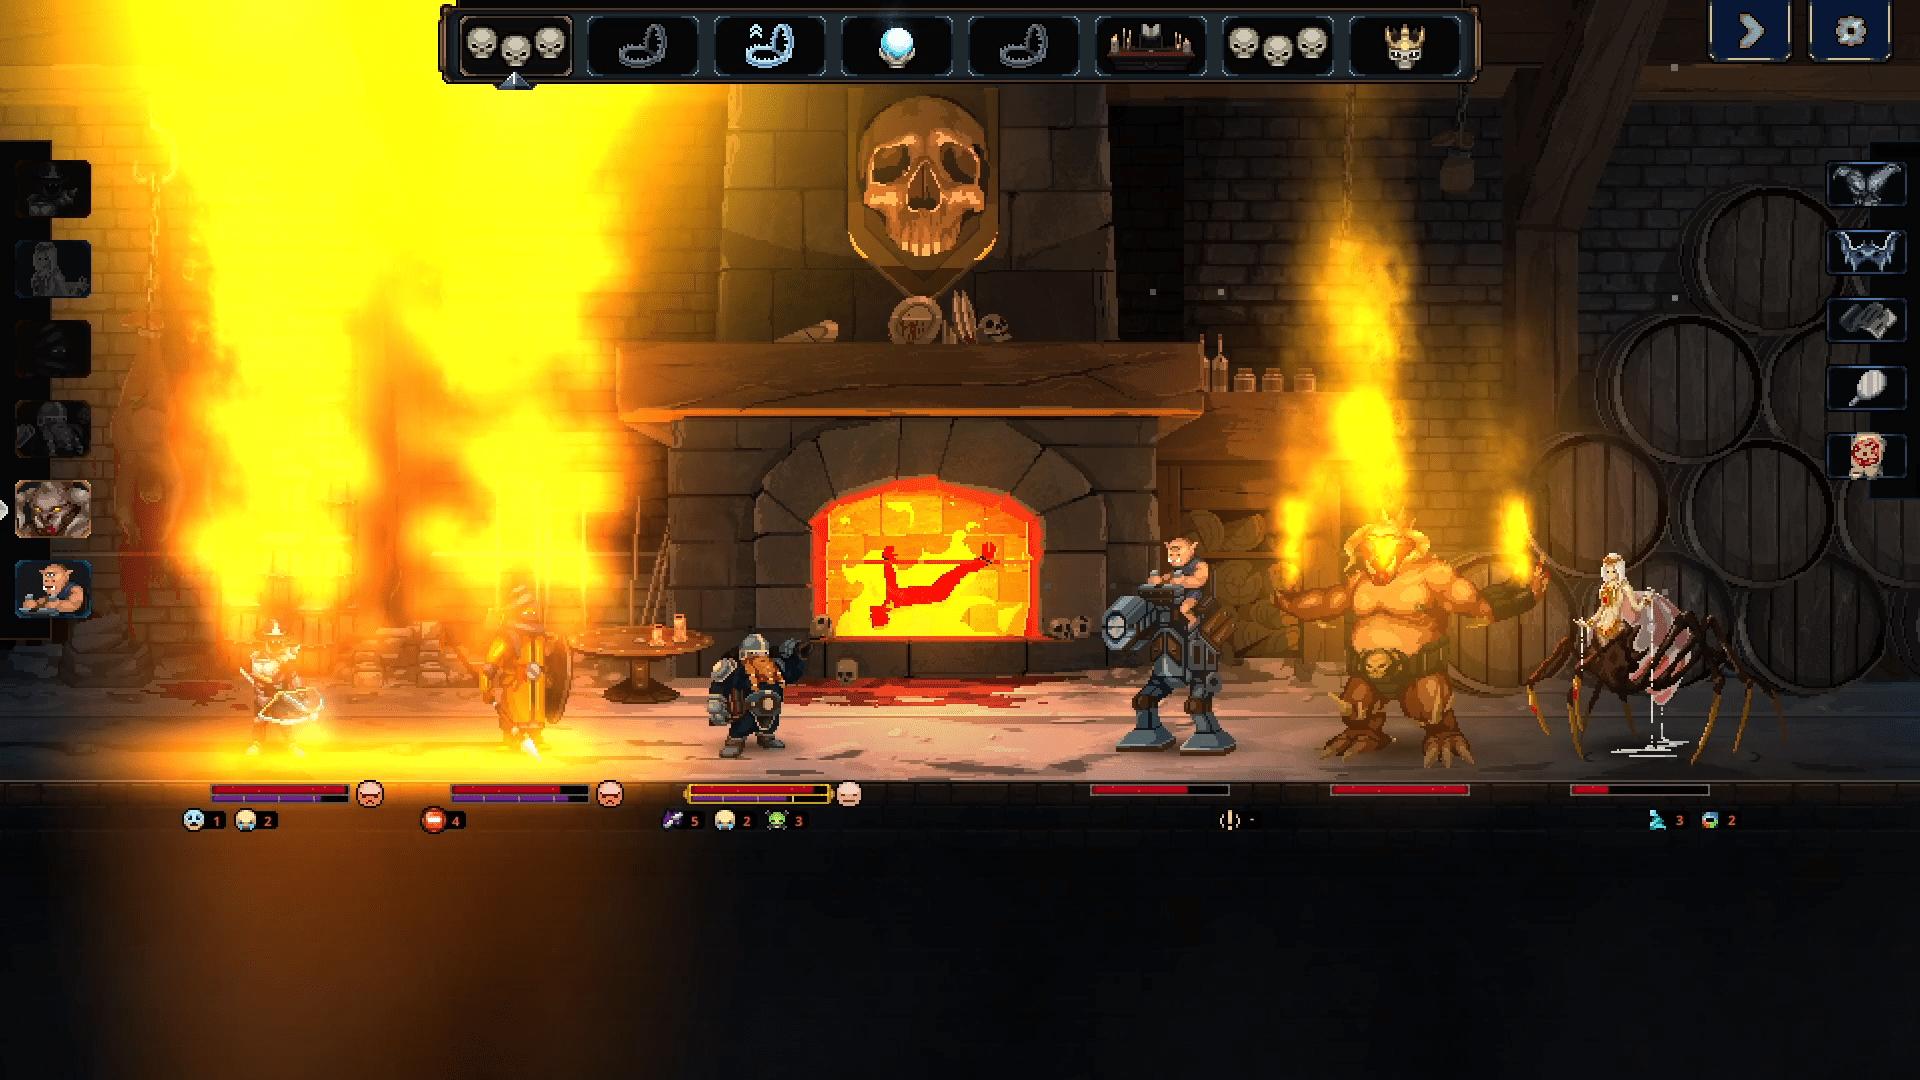 Combate de Legends of Keepers en una mazmorra de fuego.